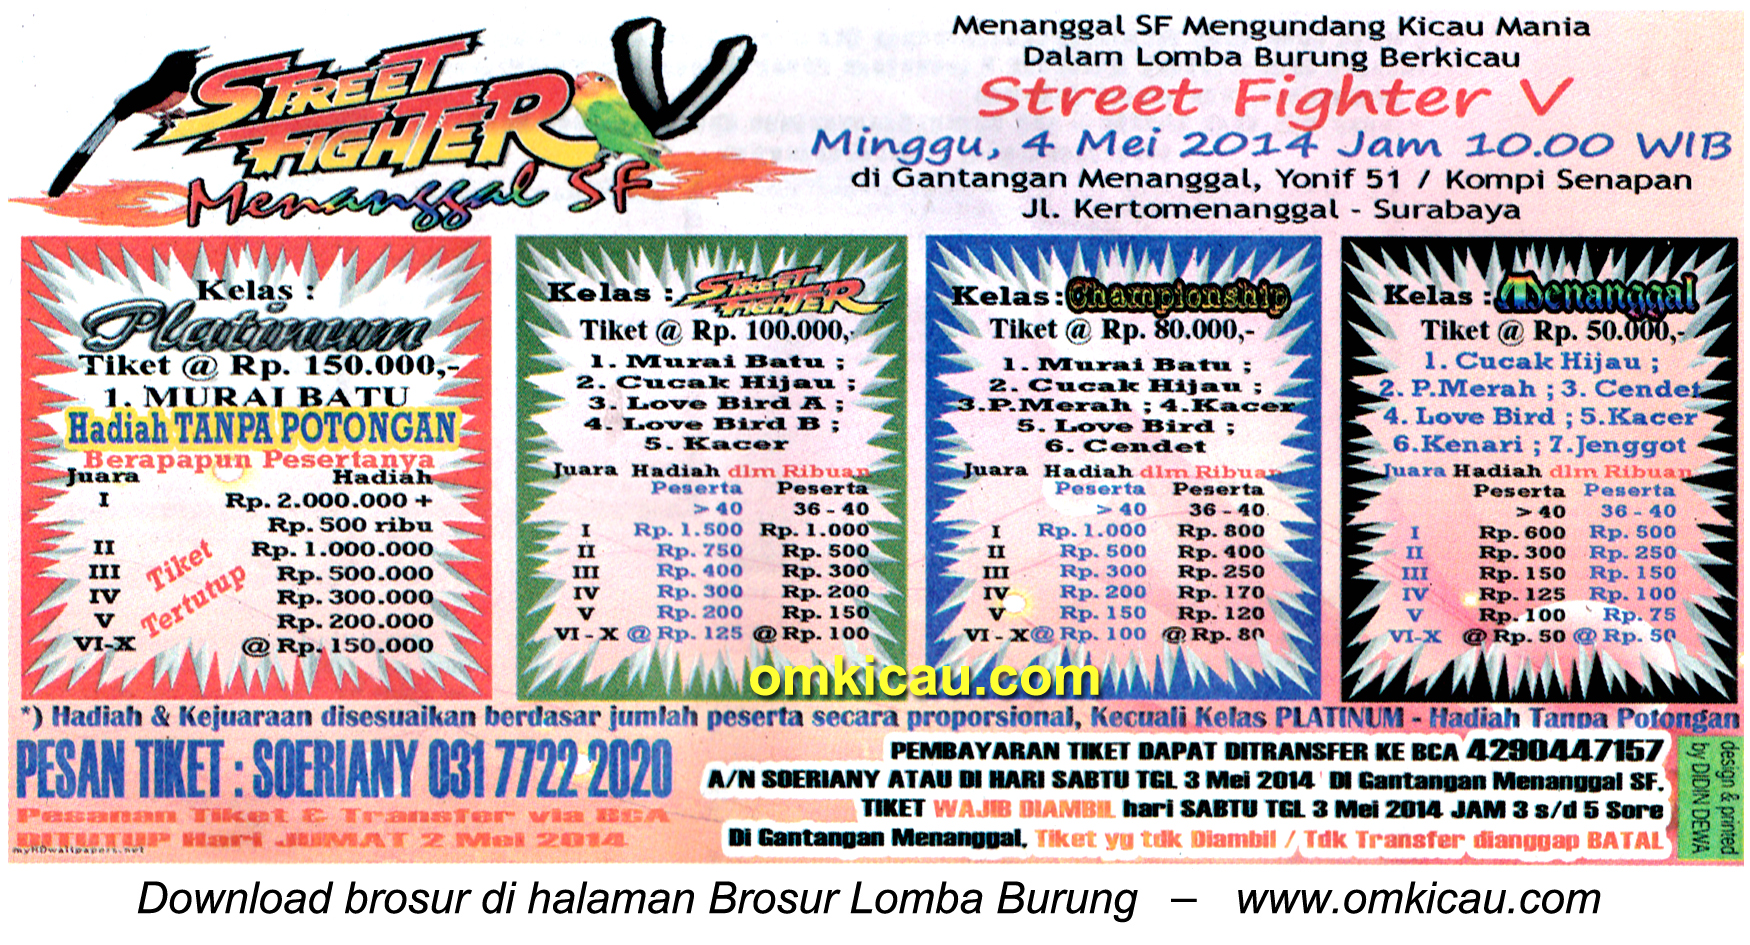 Brosur Lomba Burung Berkicau Street Fighter V, Surabaya, 4 Mei 2014